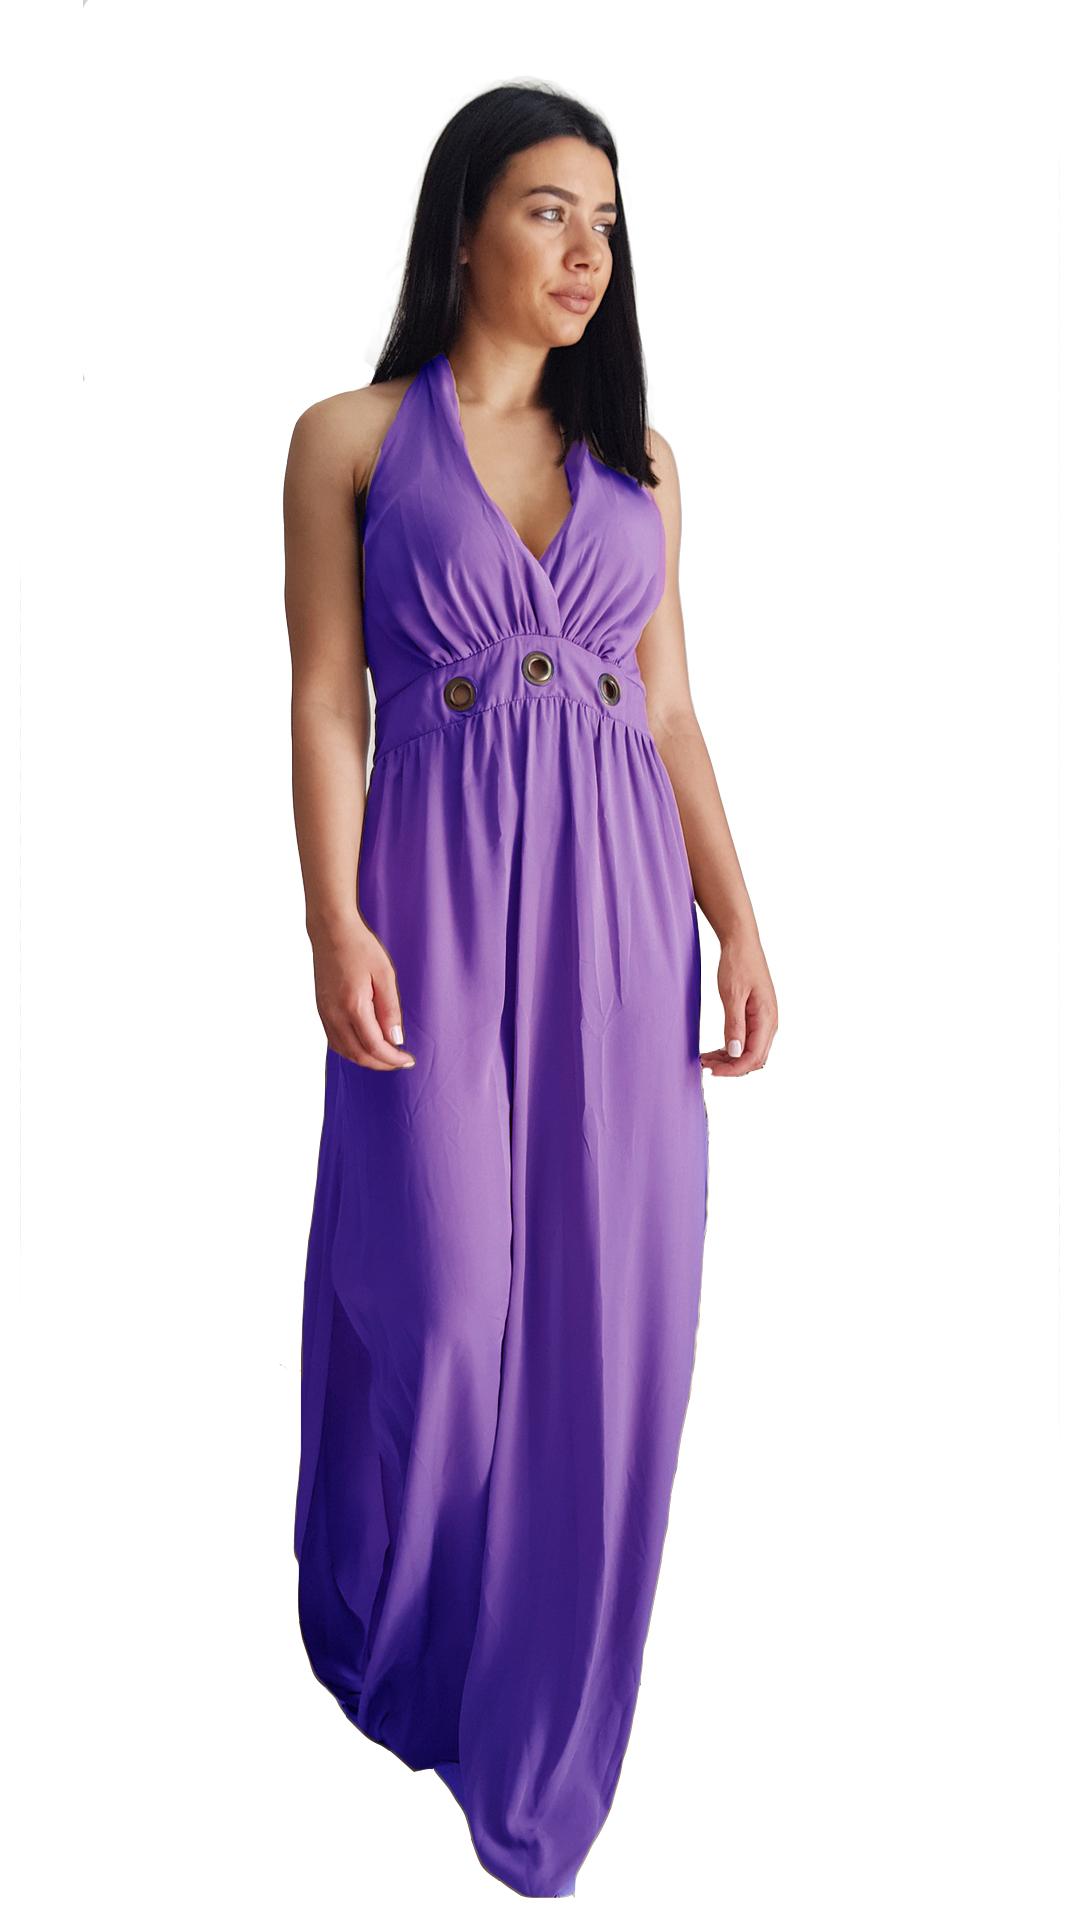 Maxi φόρεμα με σκίσιμο στο πλάι - LOVE ME - SS20LV-545936